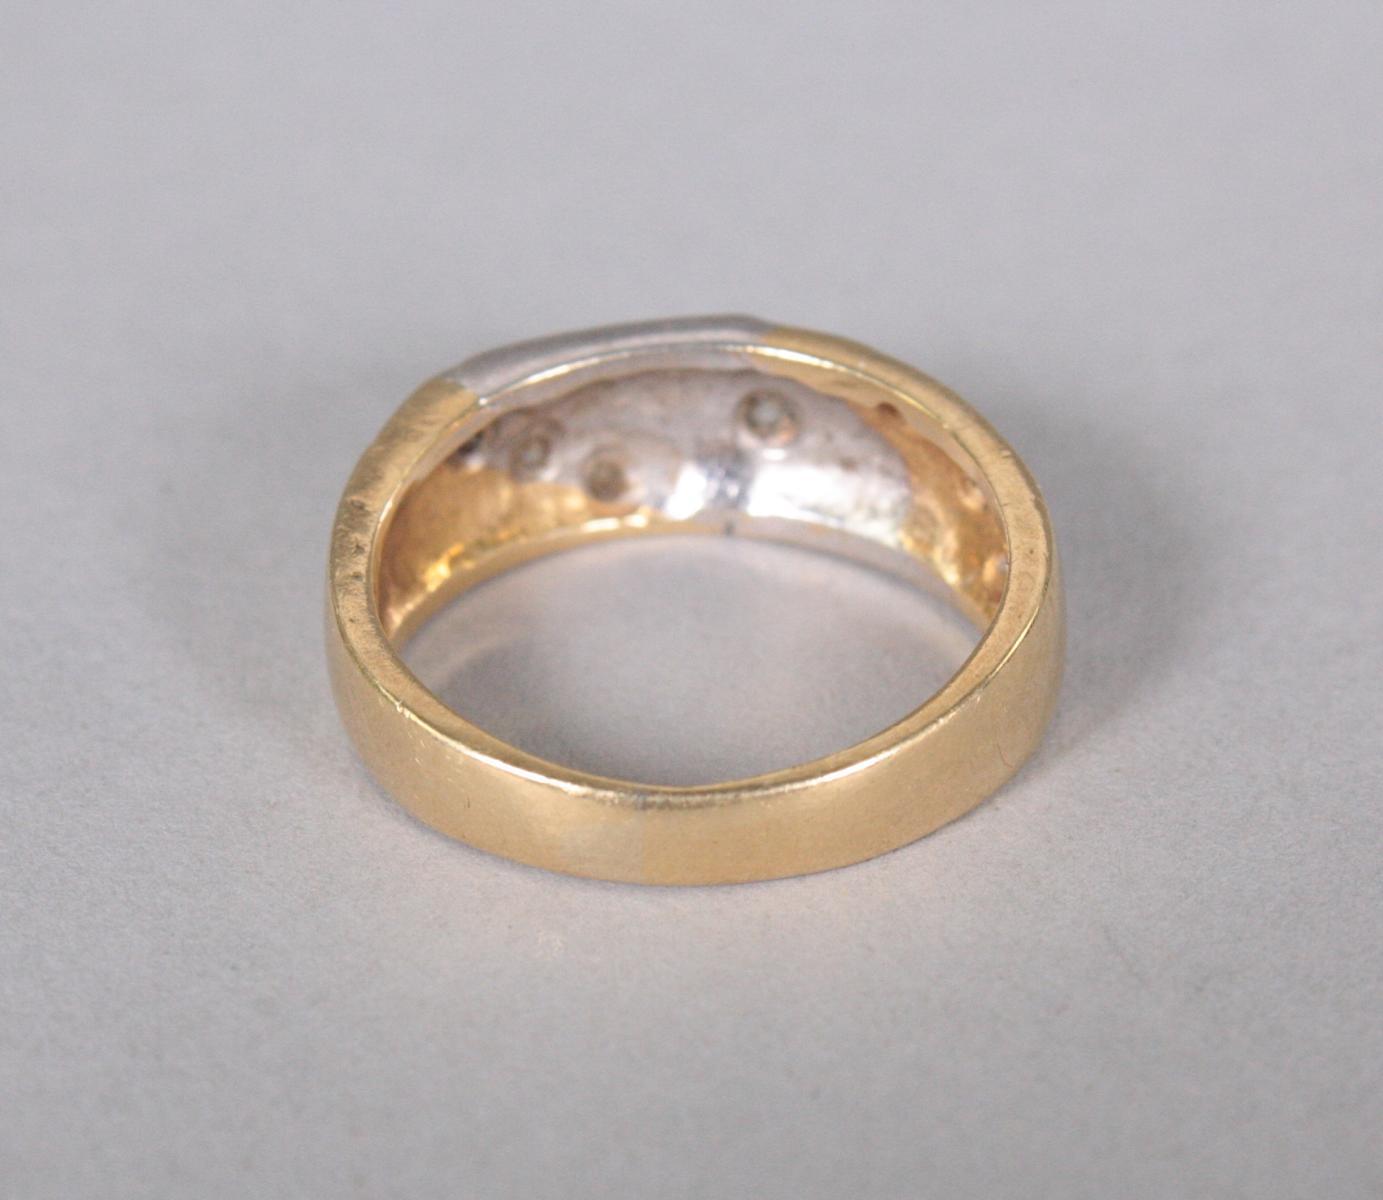 Damenring mit Diamanten, 18 Karat Gelbgold-2